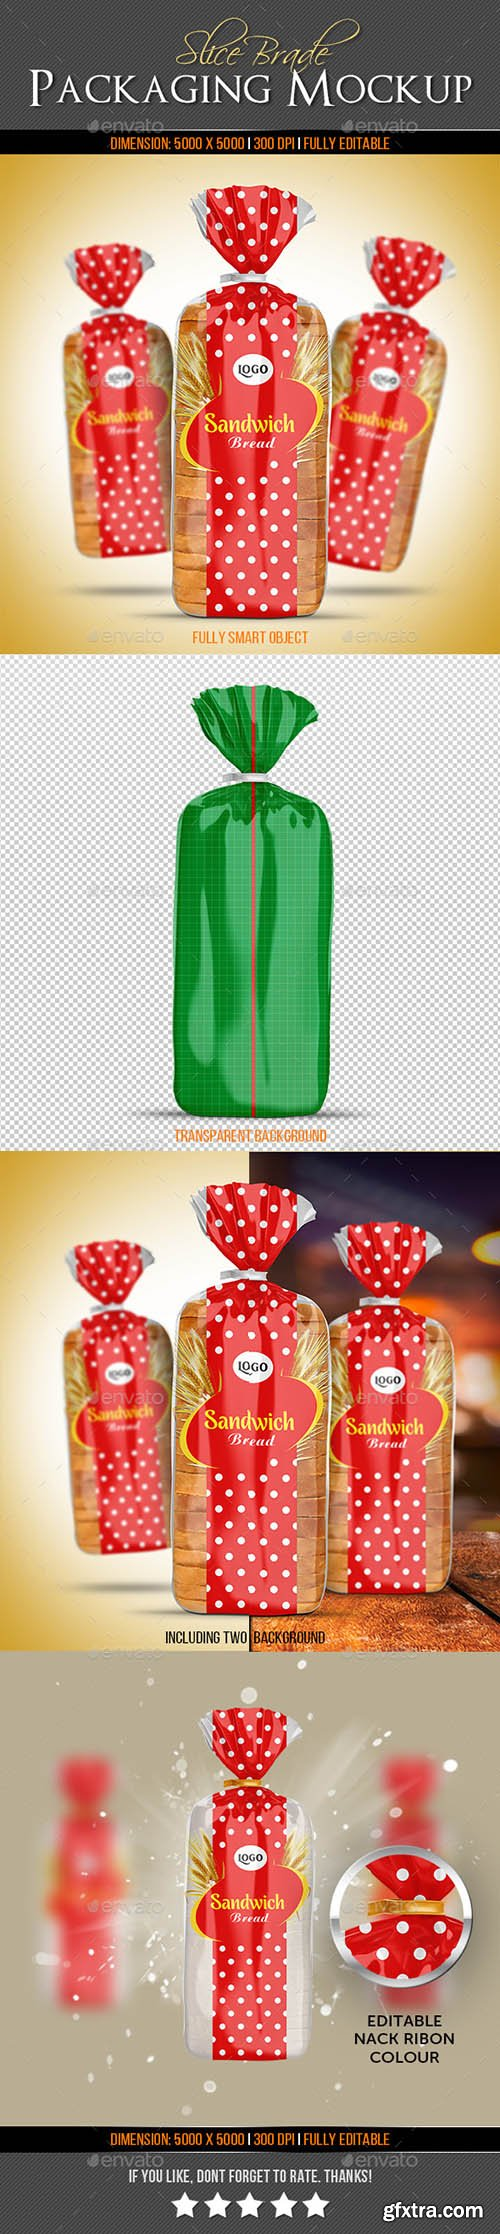 Slice Bread Packaging Mock-Up 22922839